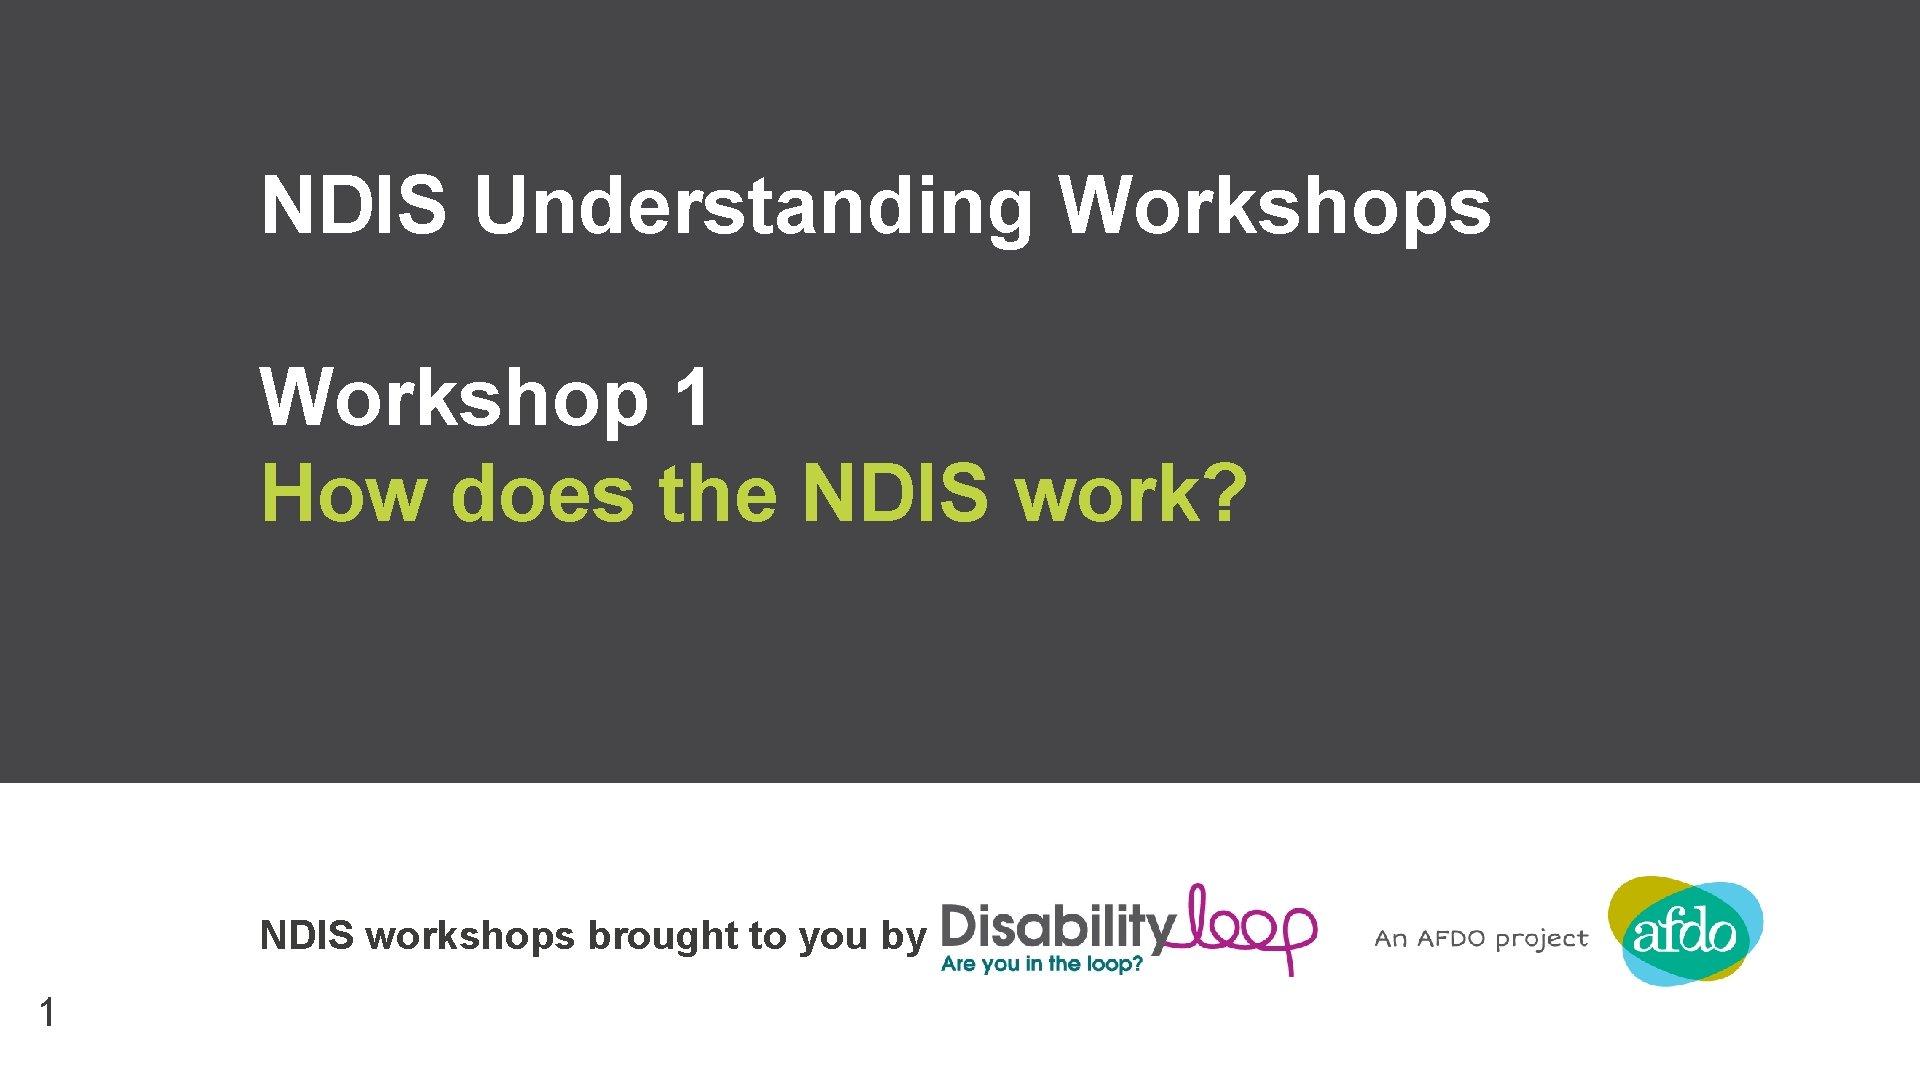 NDIS Understanding Workshops Workshop 1 How does the NDIS work? NDIS workshops brought to